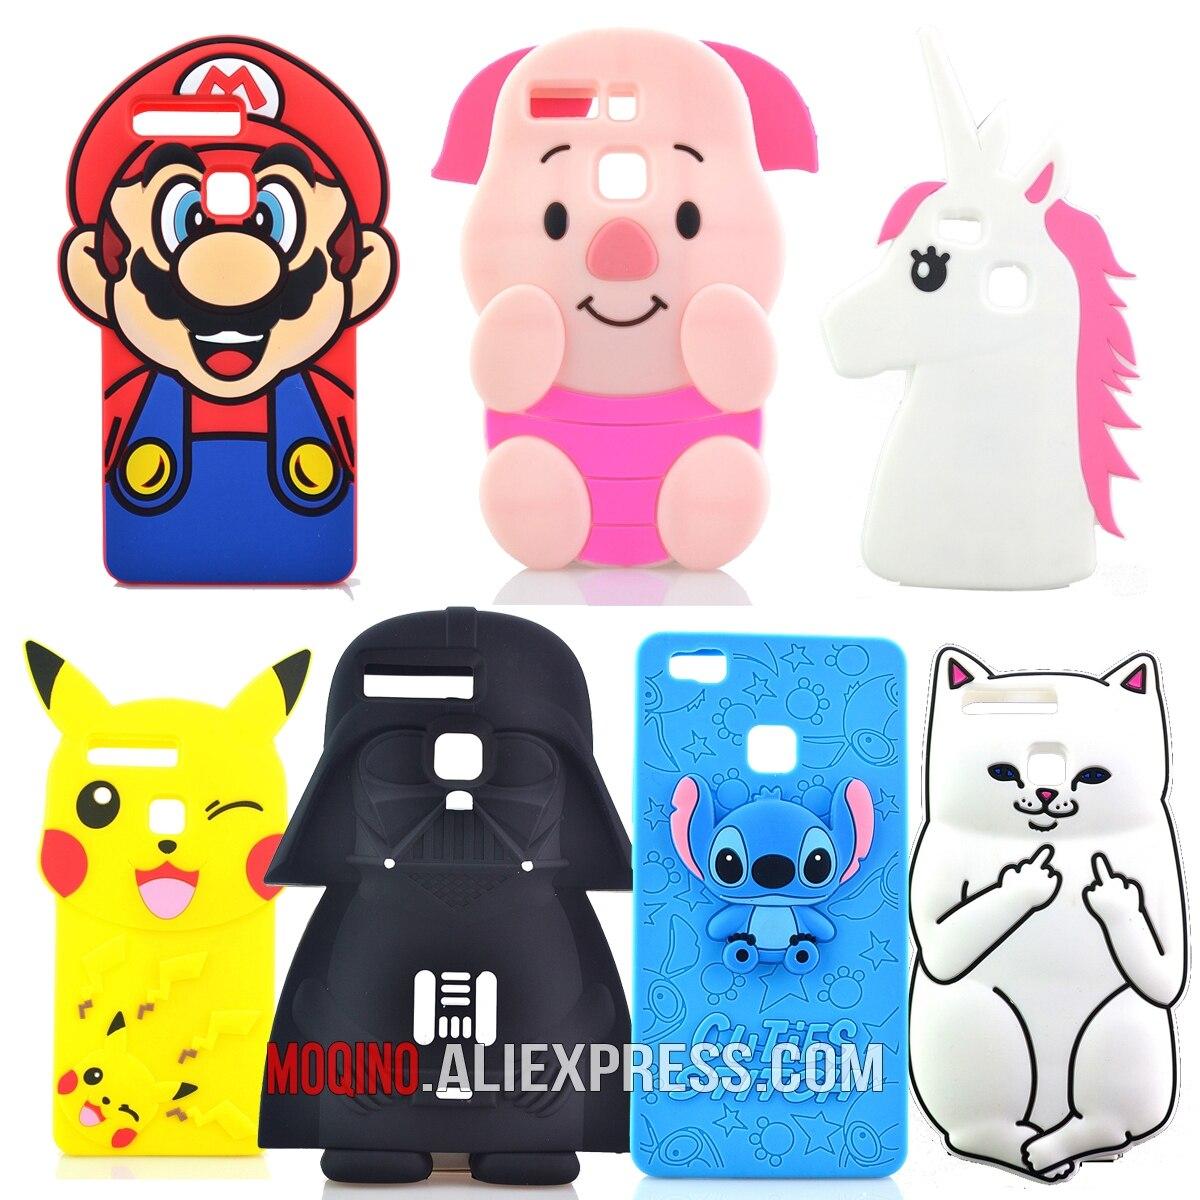 Para Huawei P9 / P9 lite Funda Star Wars Master Yoda Stitch Pocket - Accesorios y repuestos para celulares